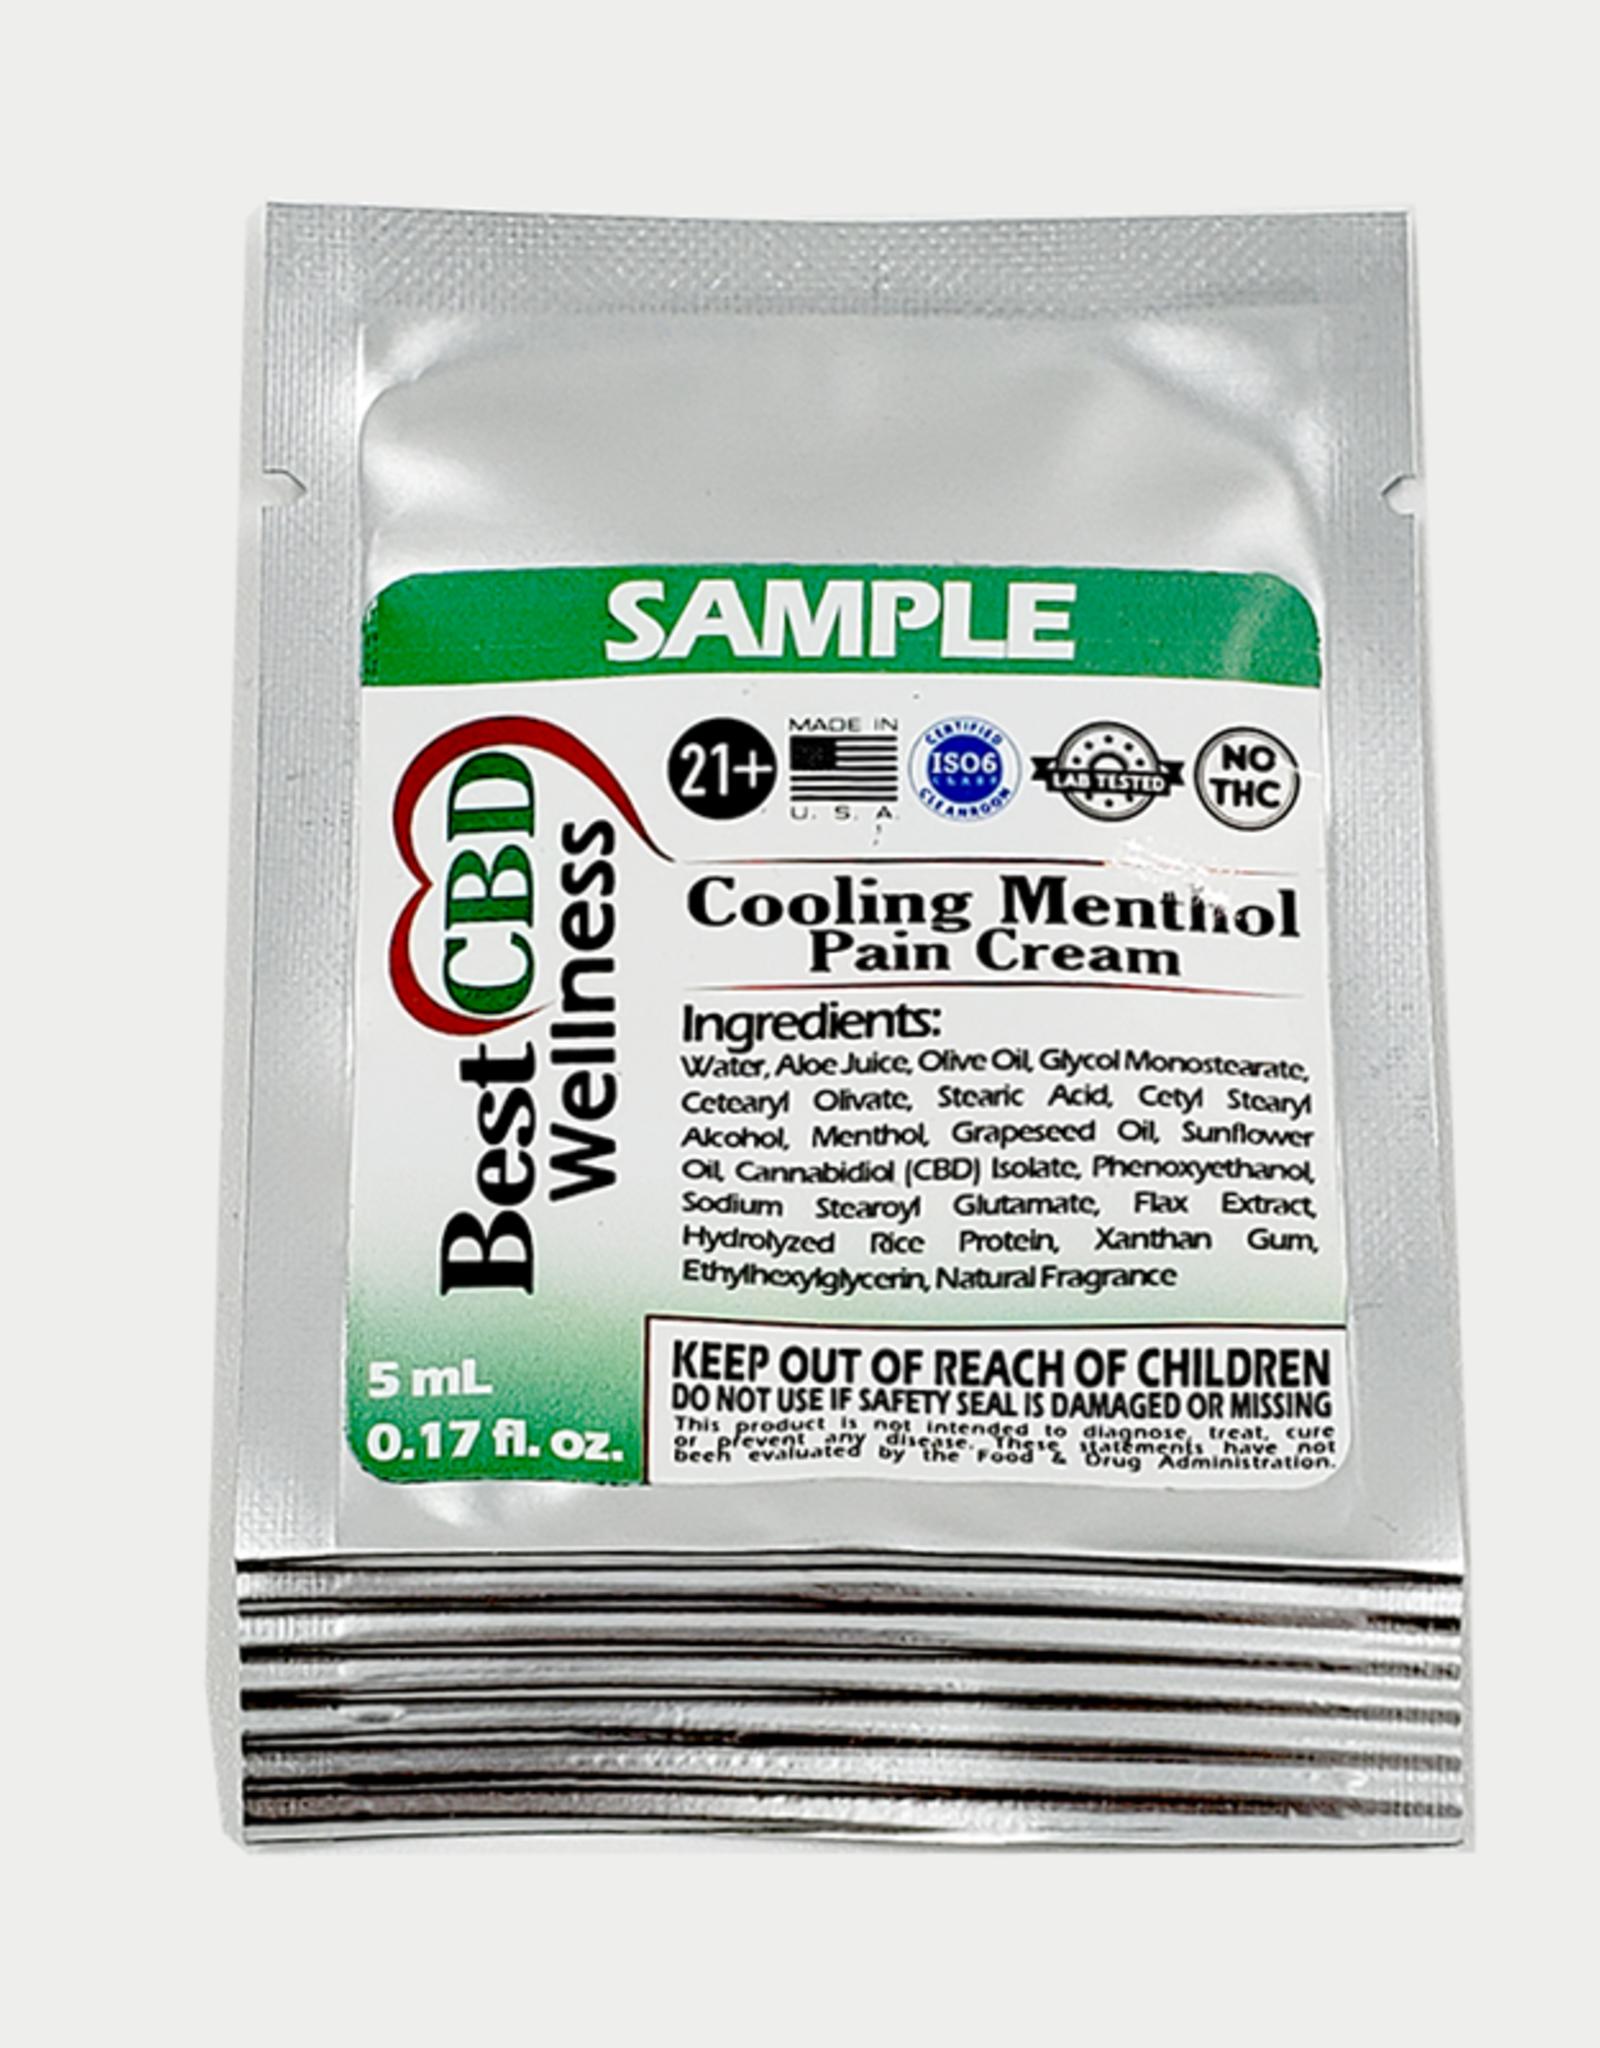 Best CBD Wellness Sample Size Isolate CBD Menthol Pain Cream 750mg/0.17 fl oz